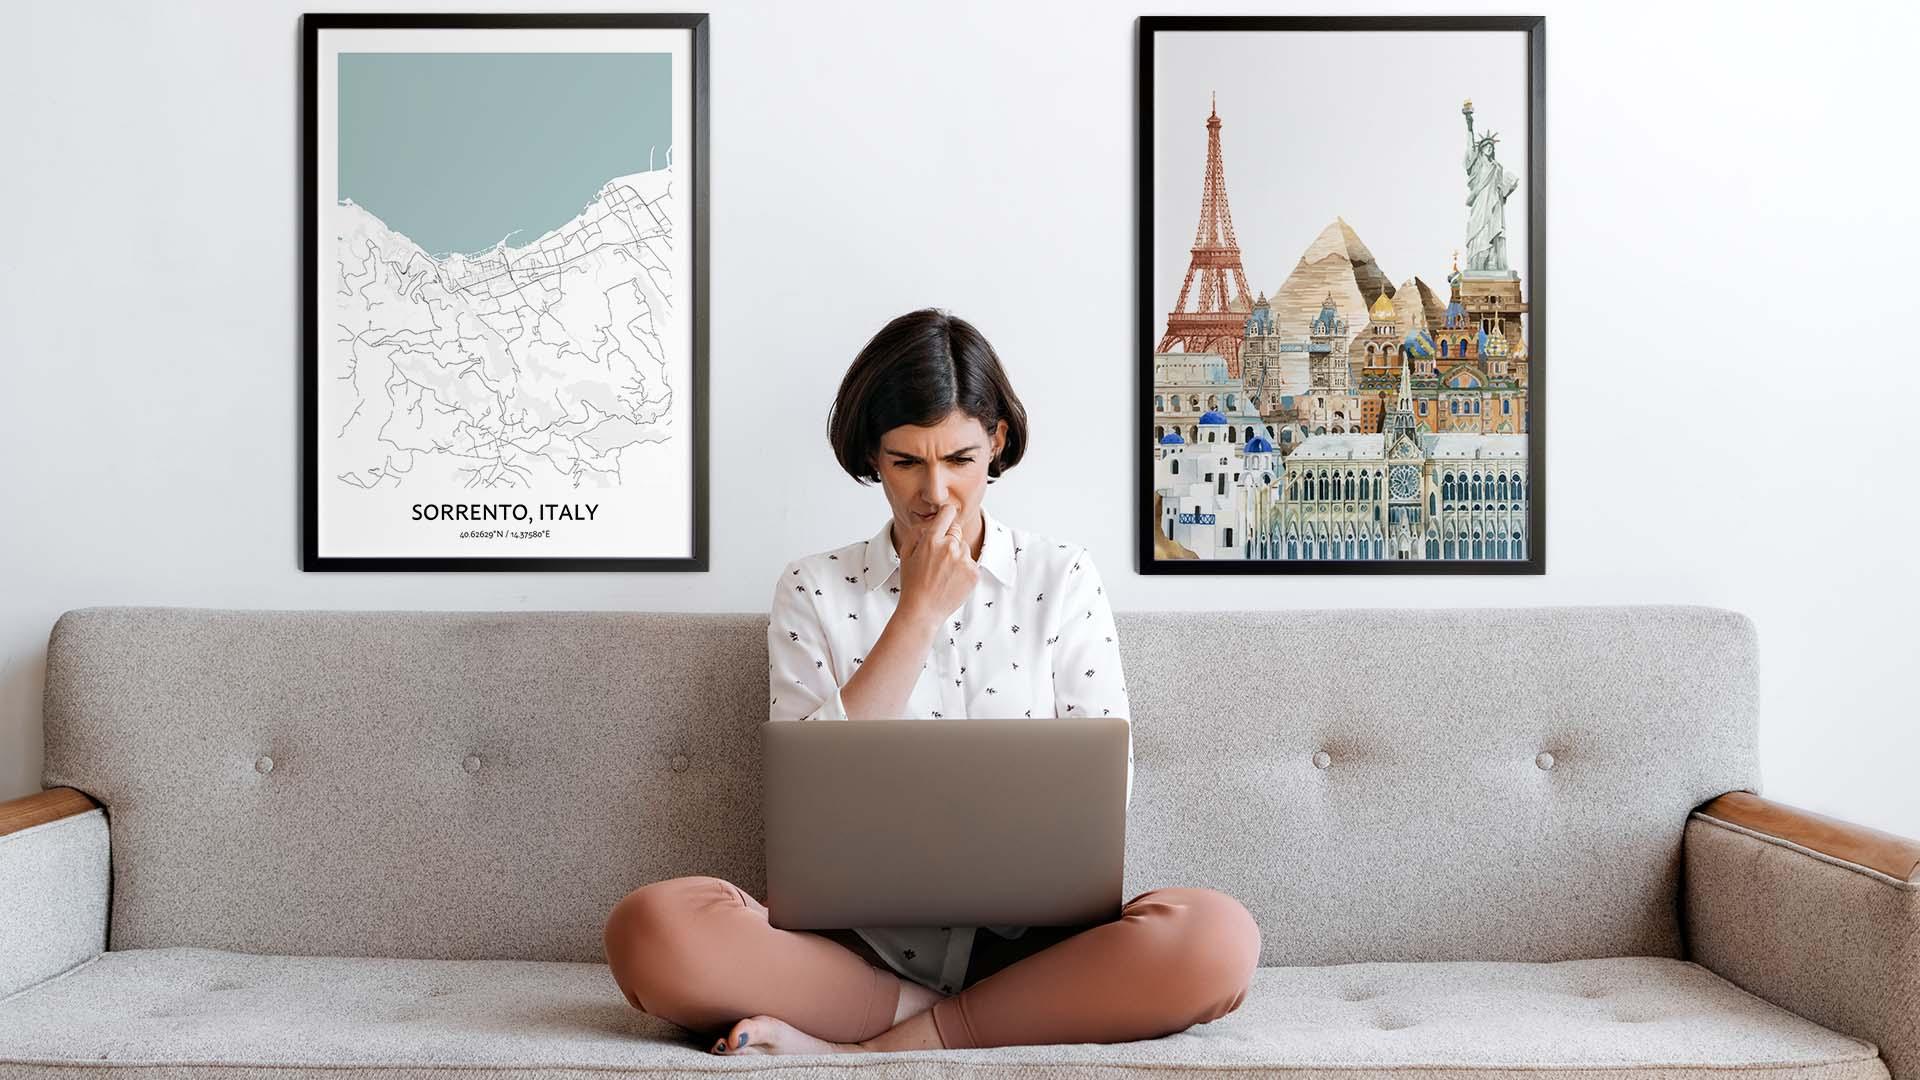 Sorrento city map art